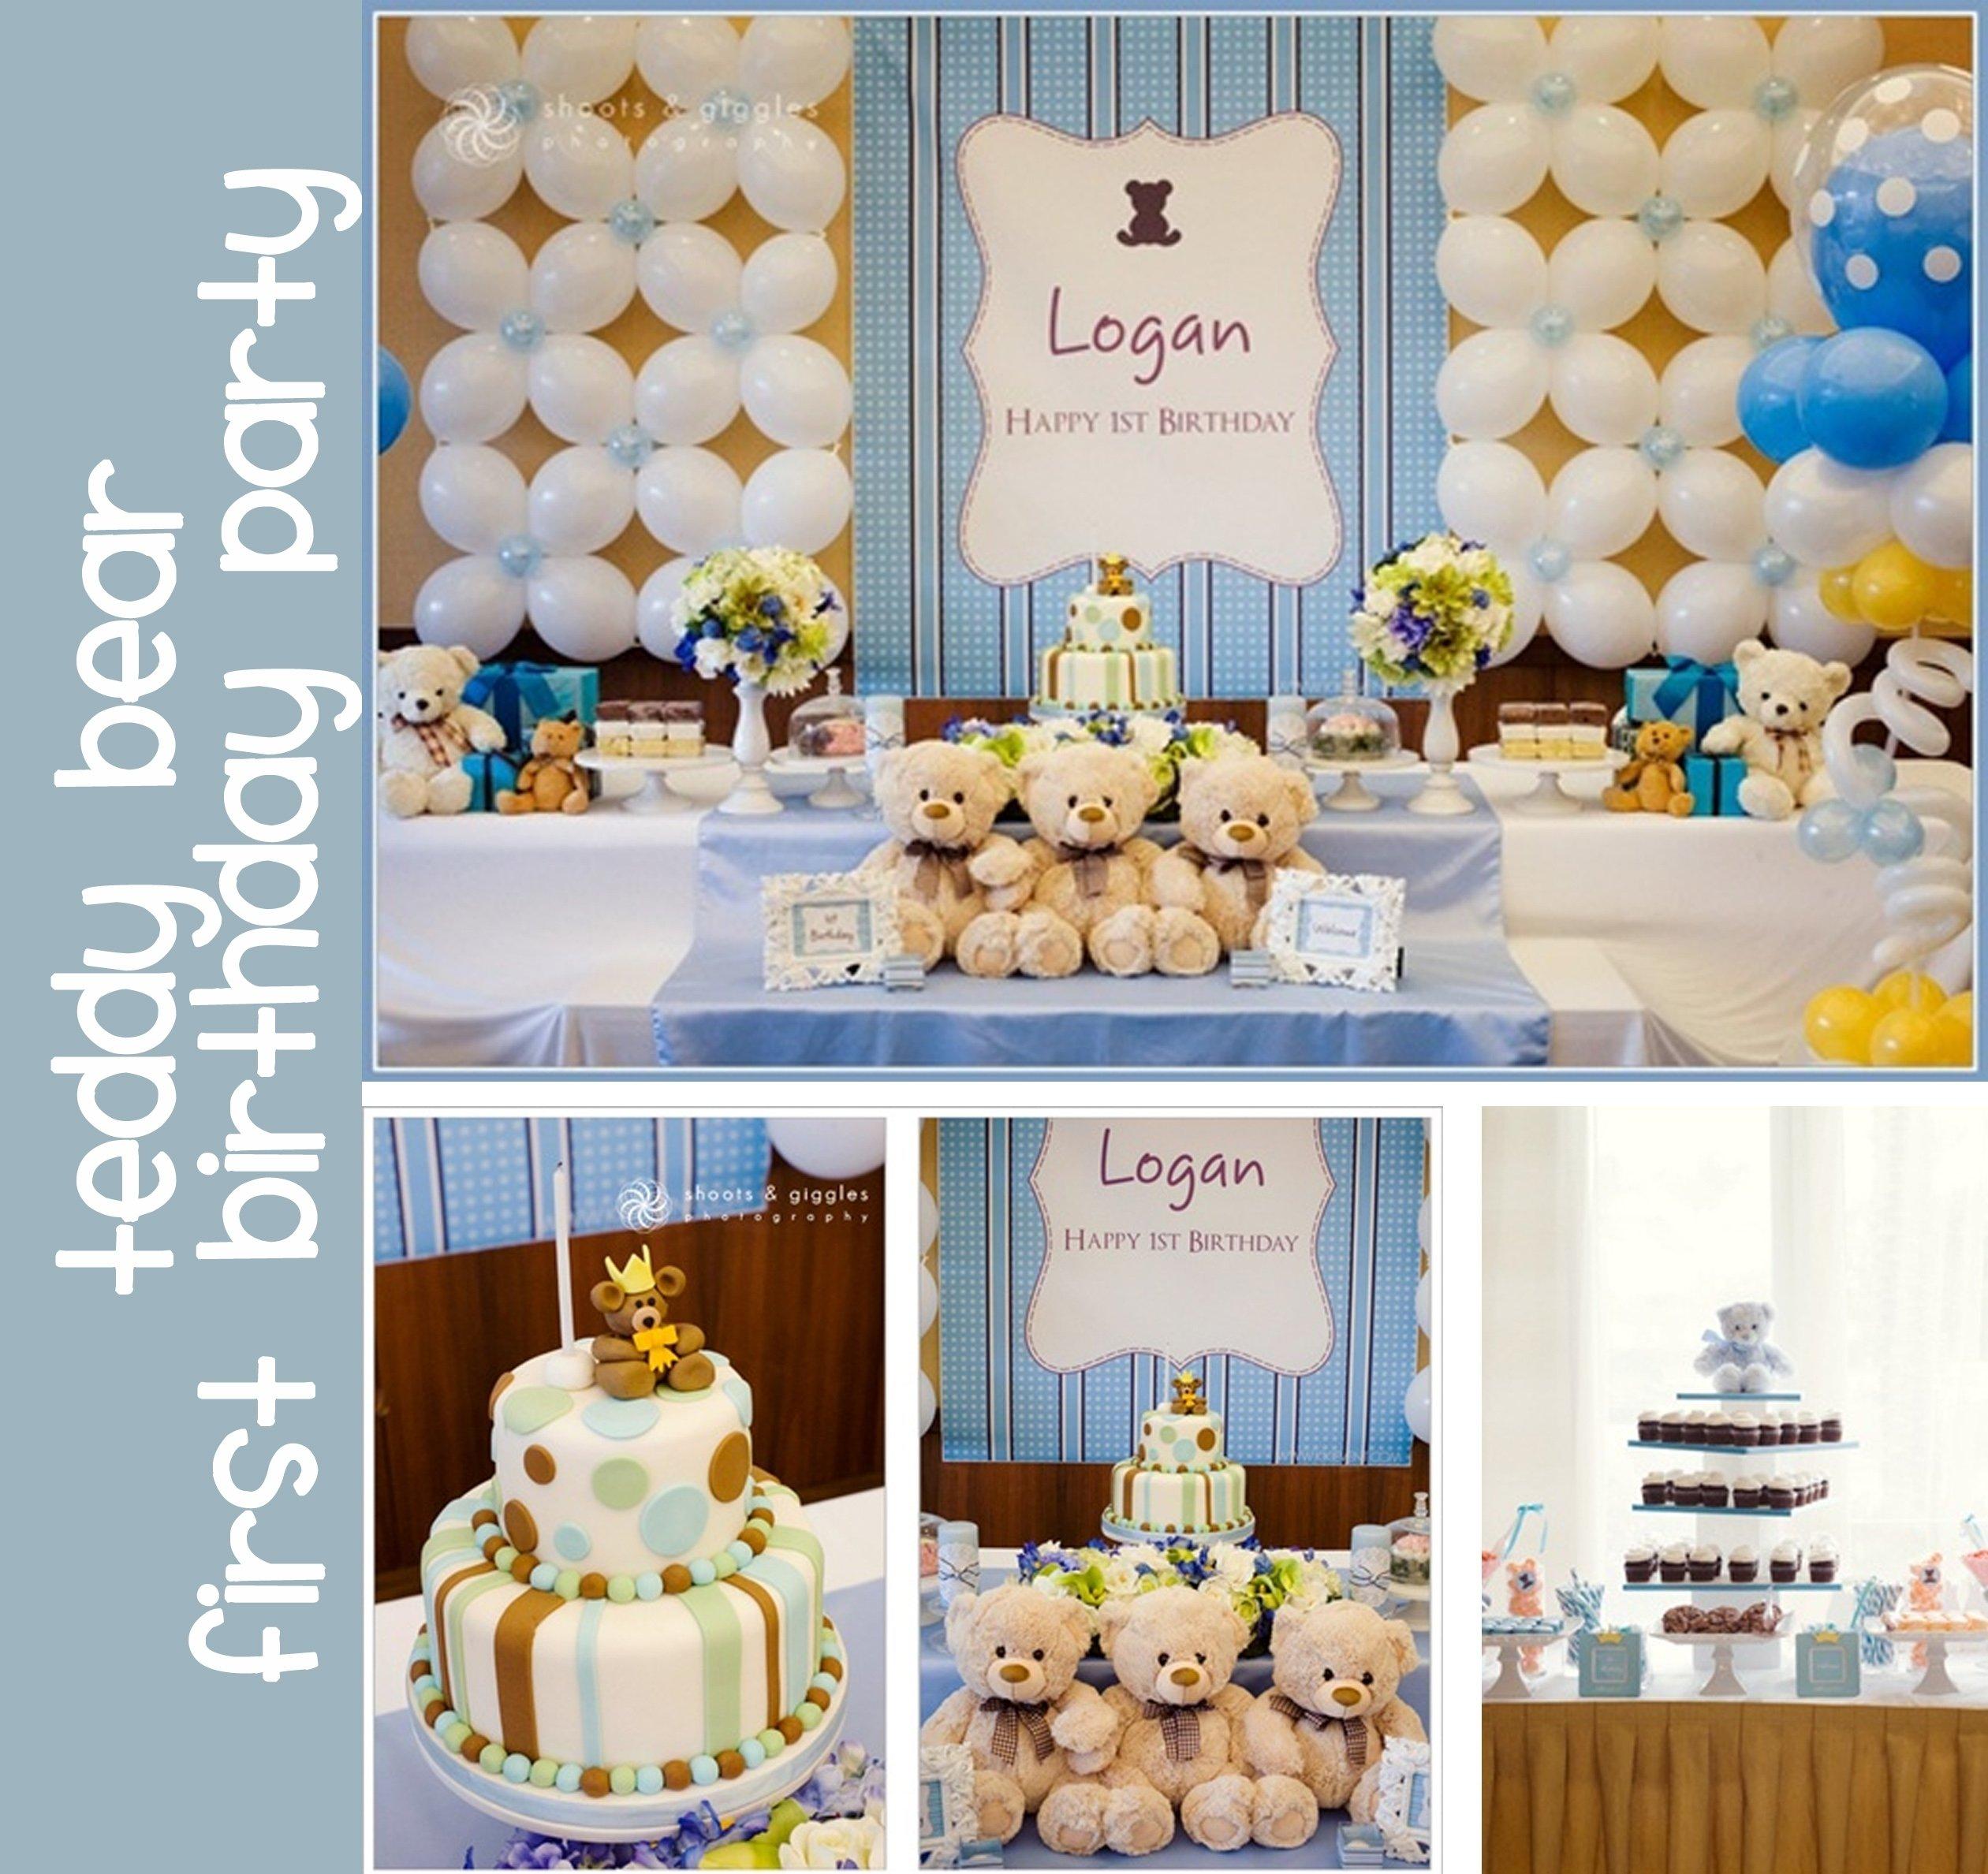 10 Stylish 1St Birthday Party Decoration Ideas baby first birthday ideas for boy first birthday teddy bear theme 6